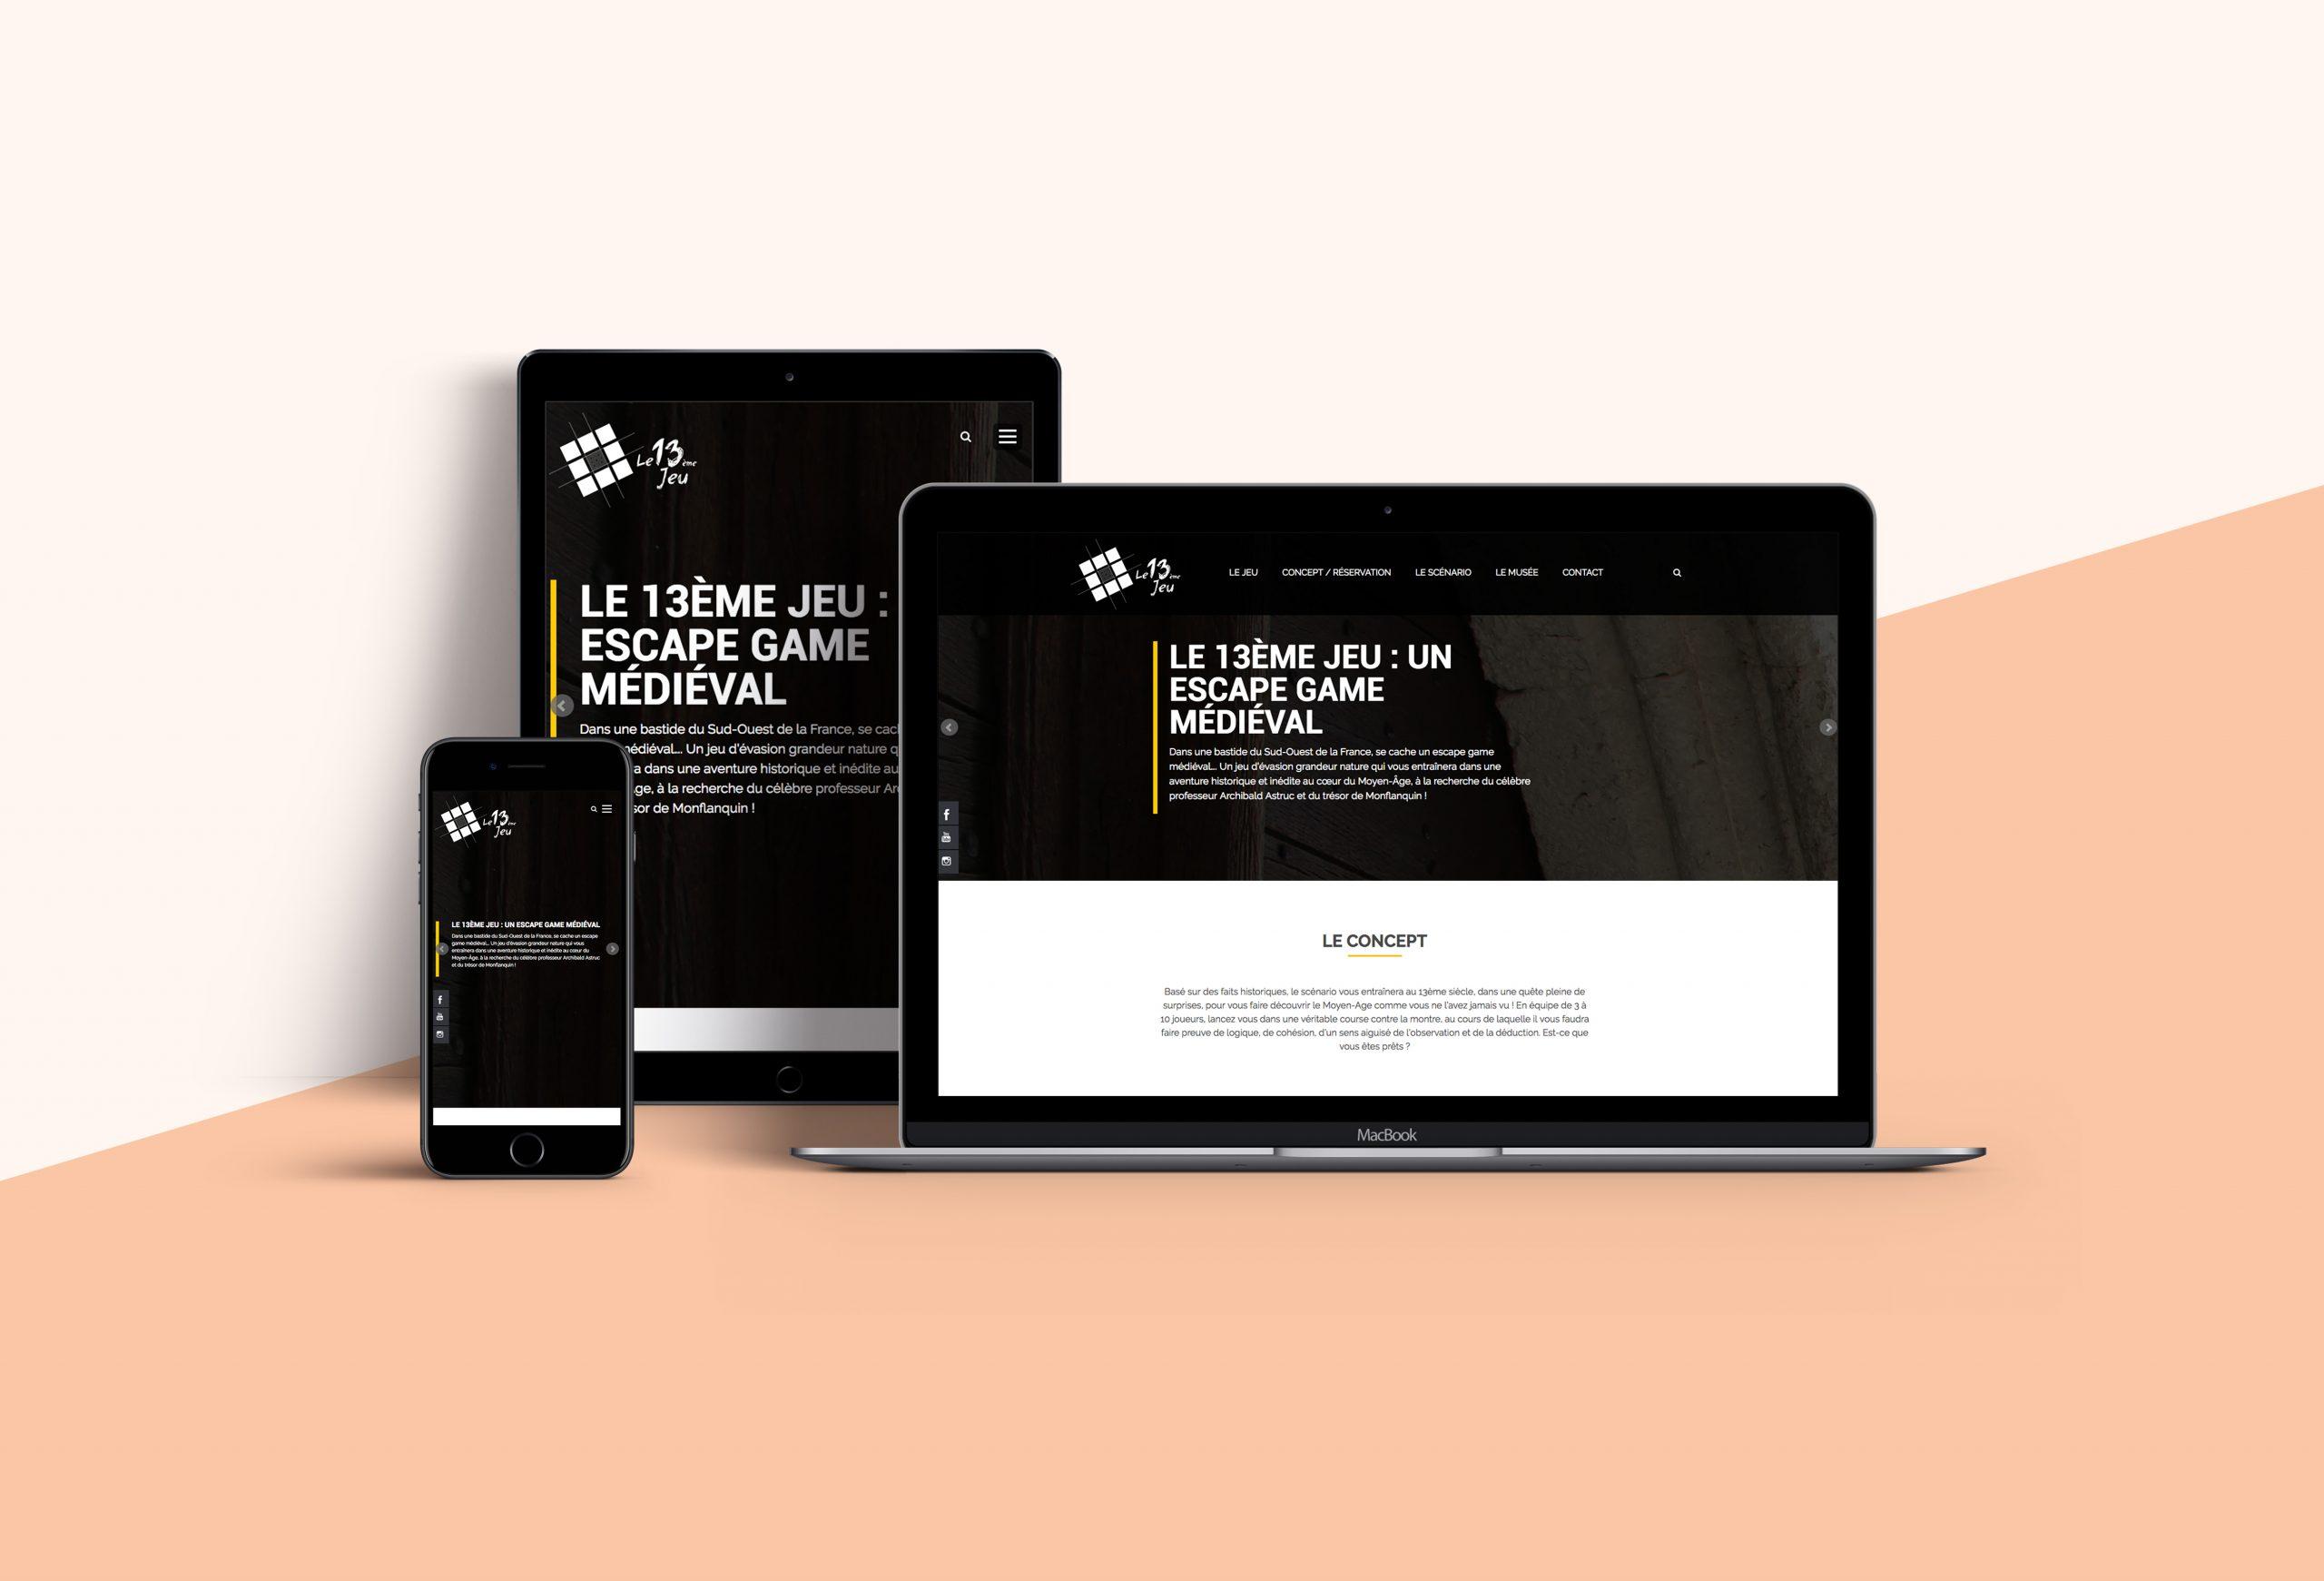 webdesign site Internet 13ème jeu